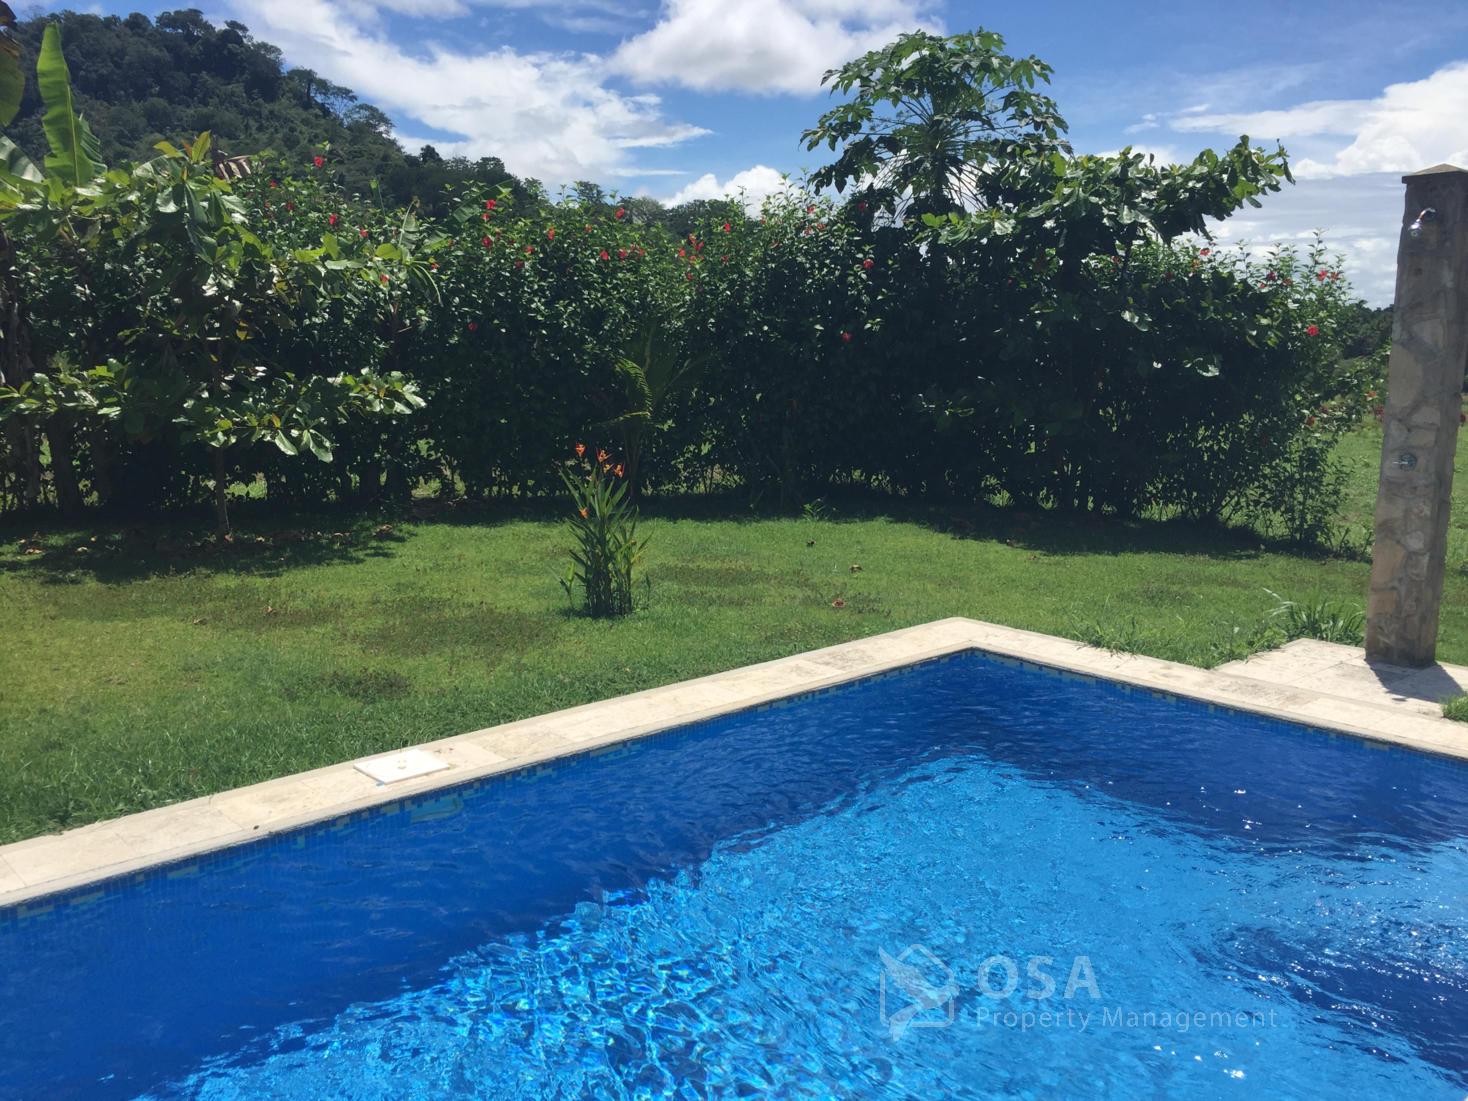 casa kingfisher pool